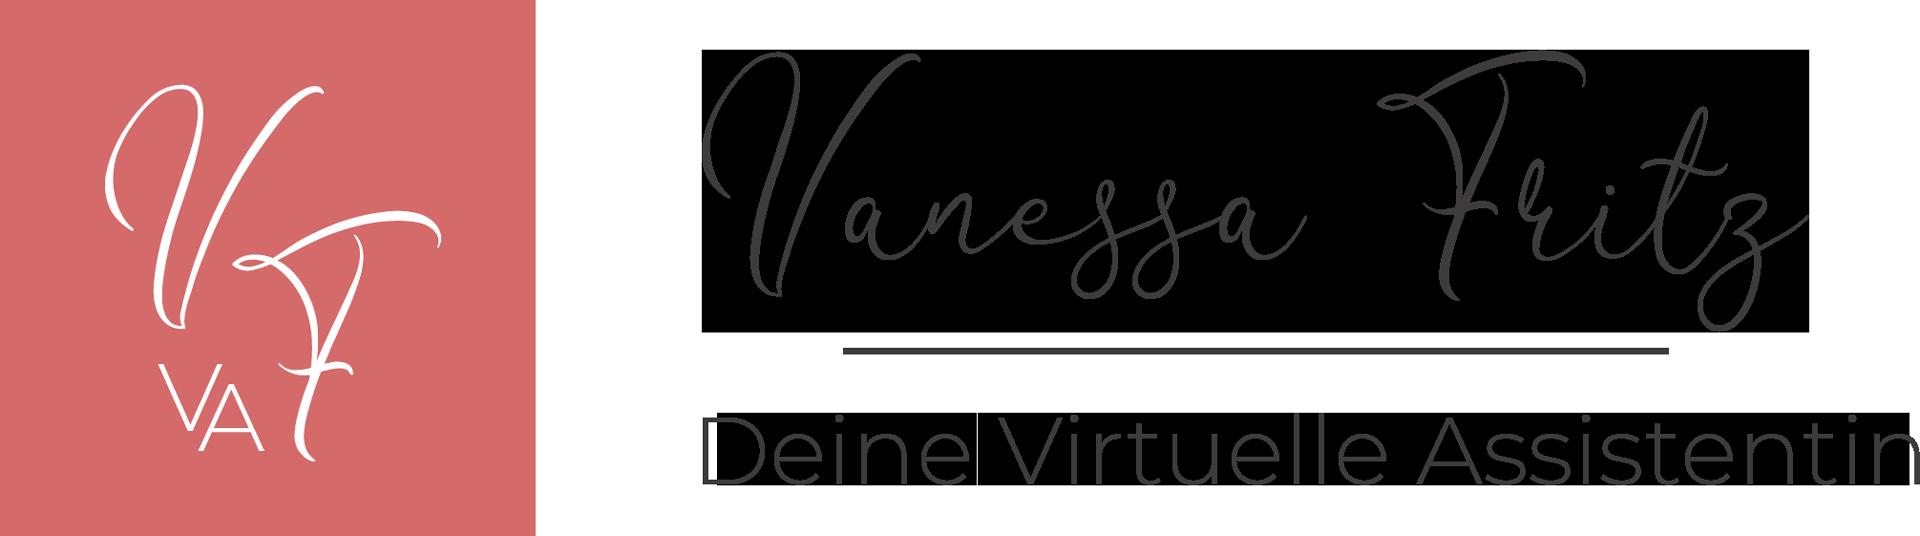 Vanessa Fritz | Deine Virtuelle Assistentin